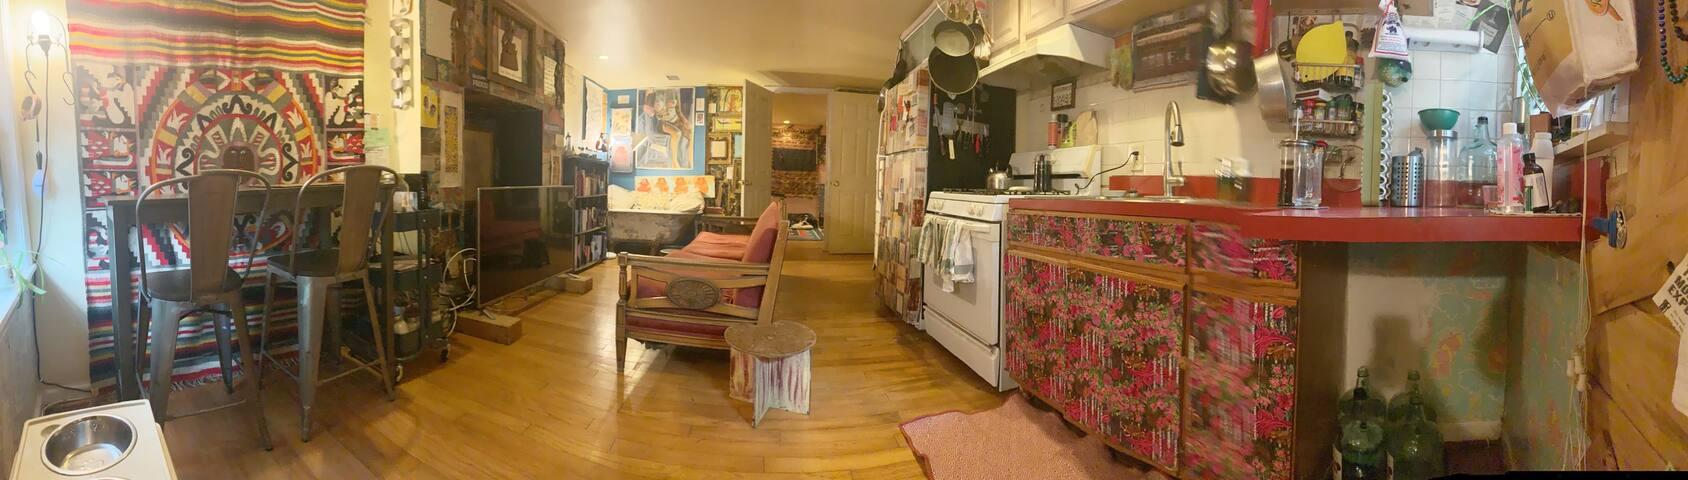 Beautiful Bohemian artsy lower level Apartment